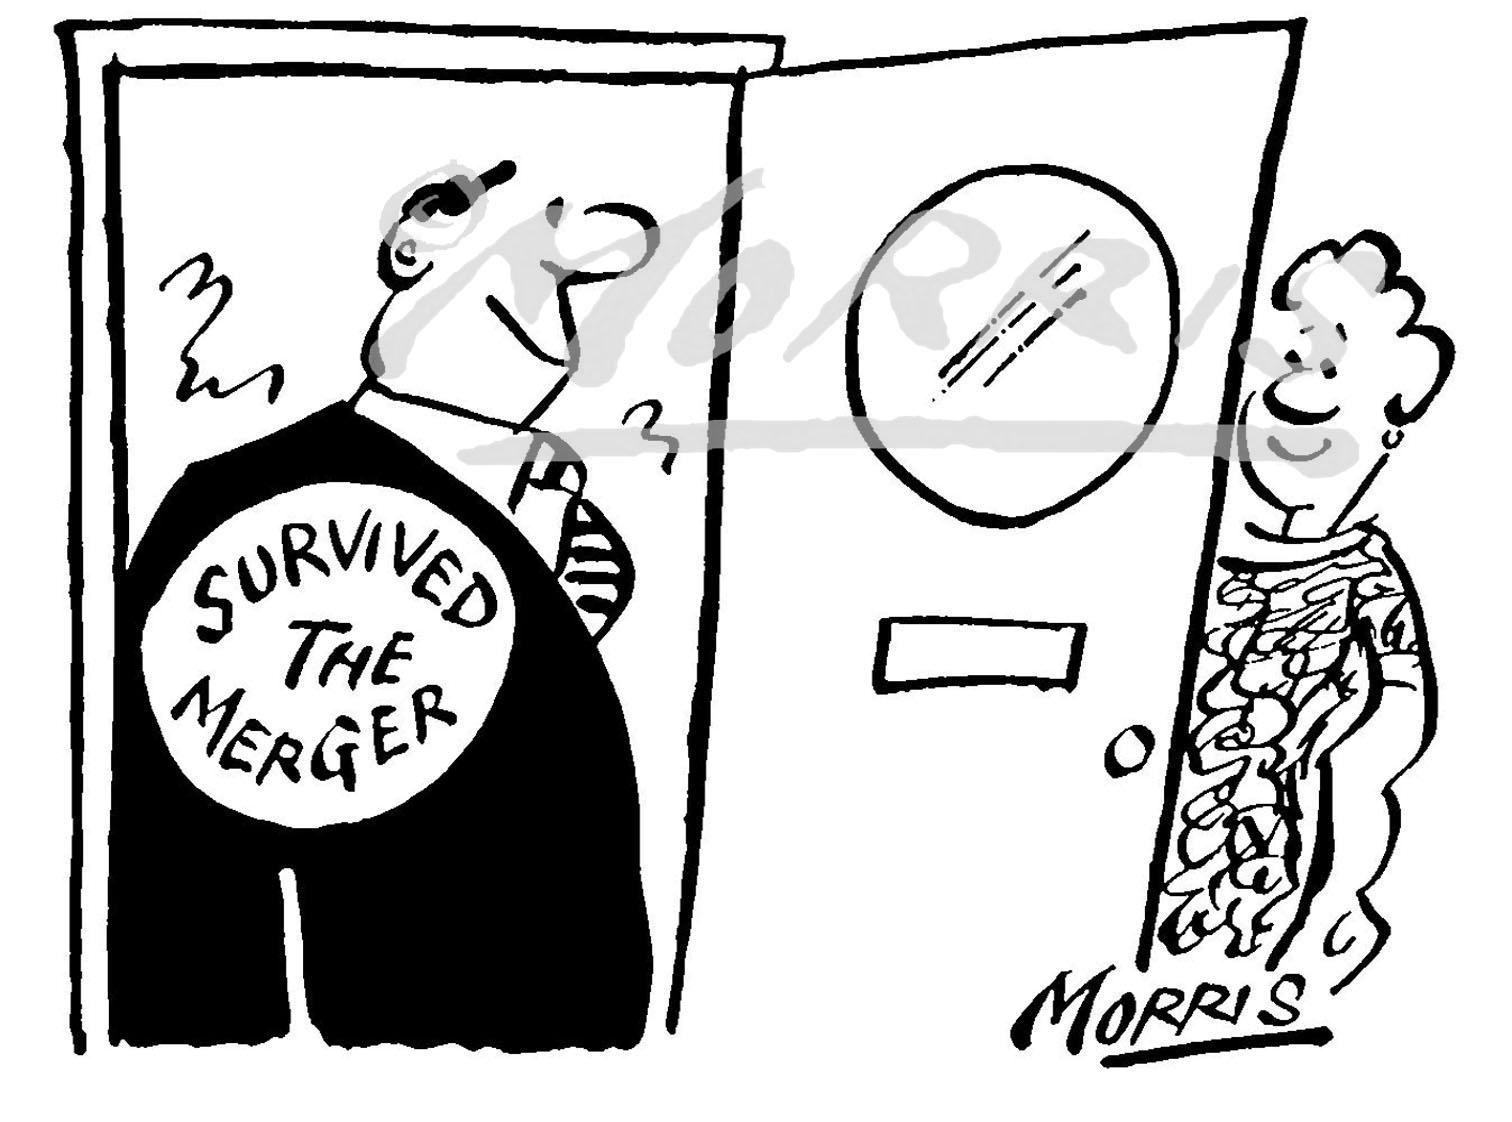 Chairman president merger cartoon Ref: 1641bw